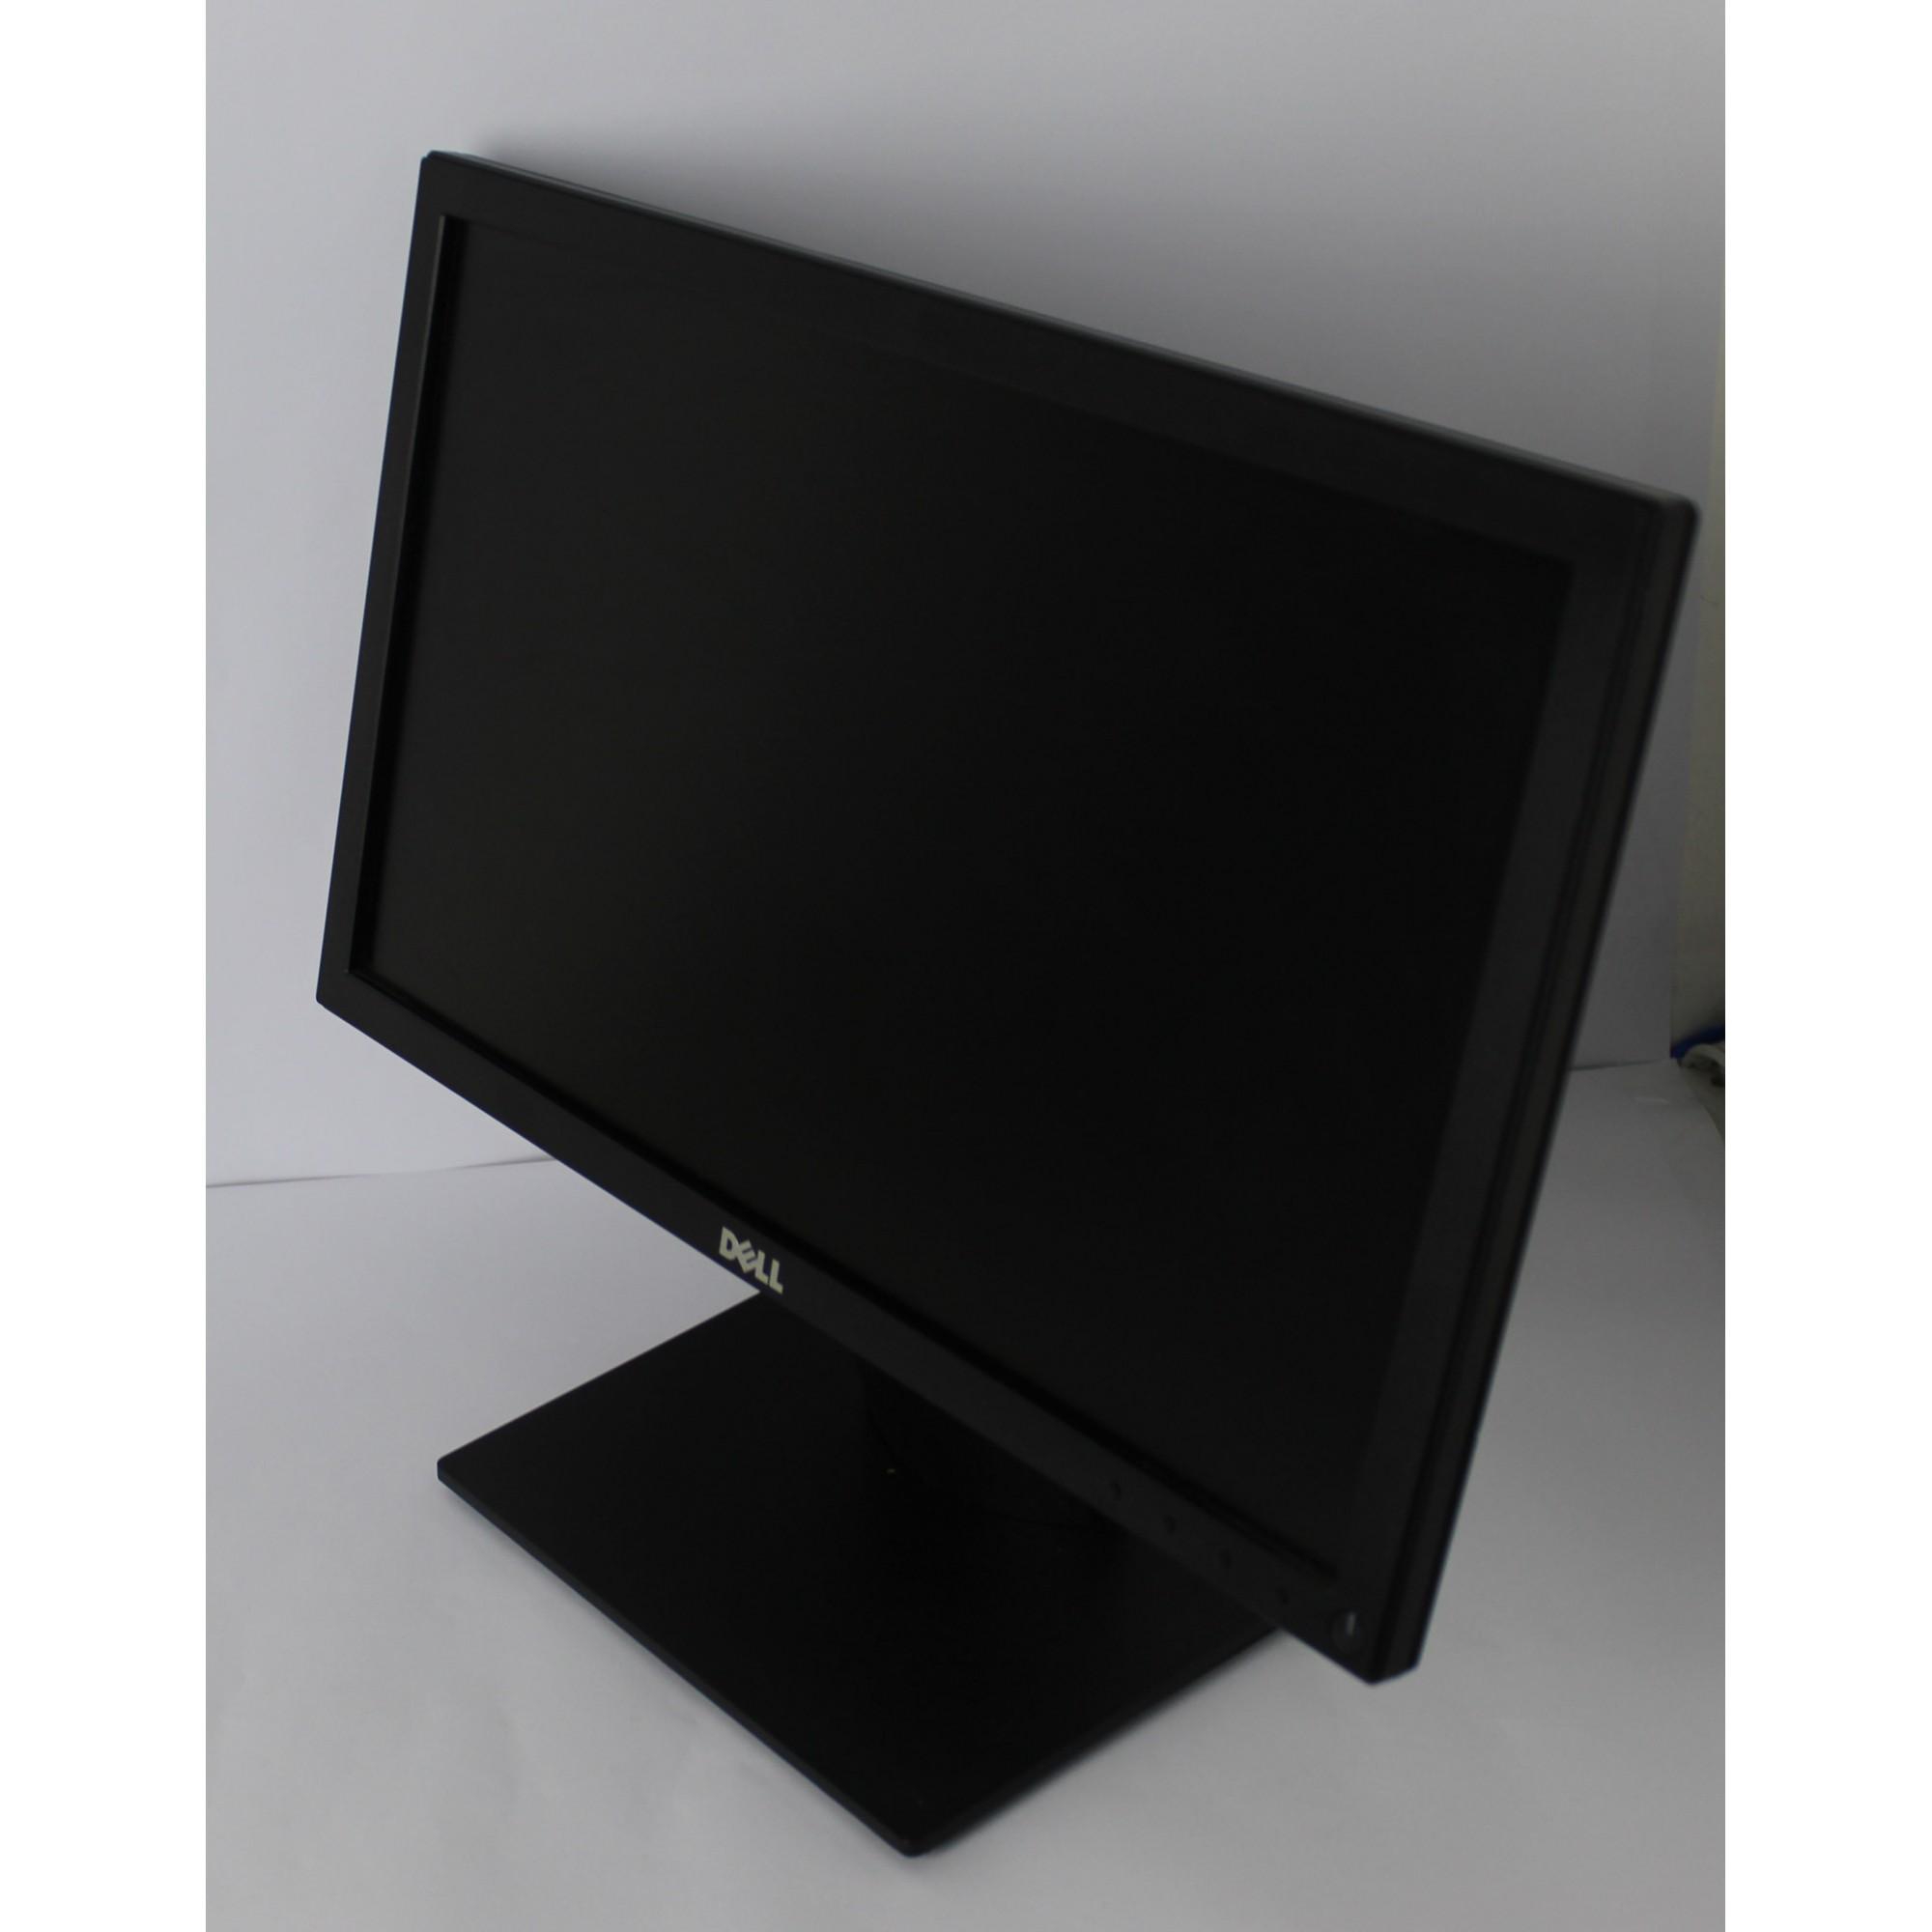 Monitor Dell E1916hf 18.5 Polegadas-LCD